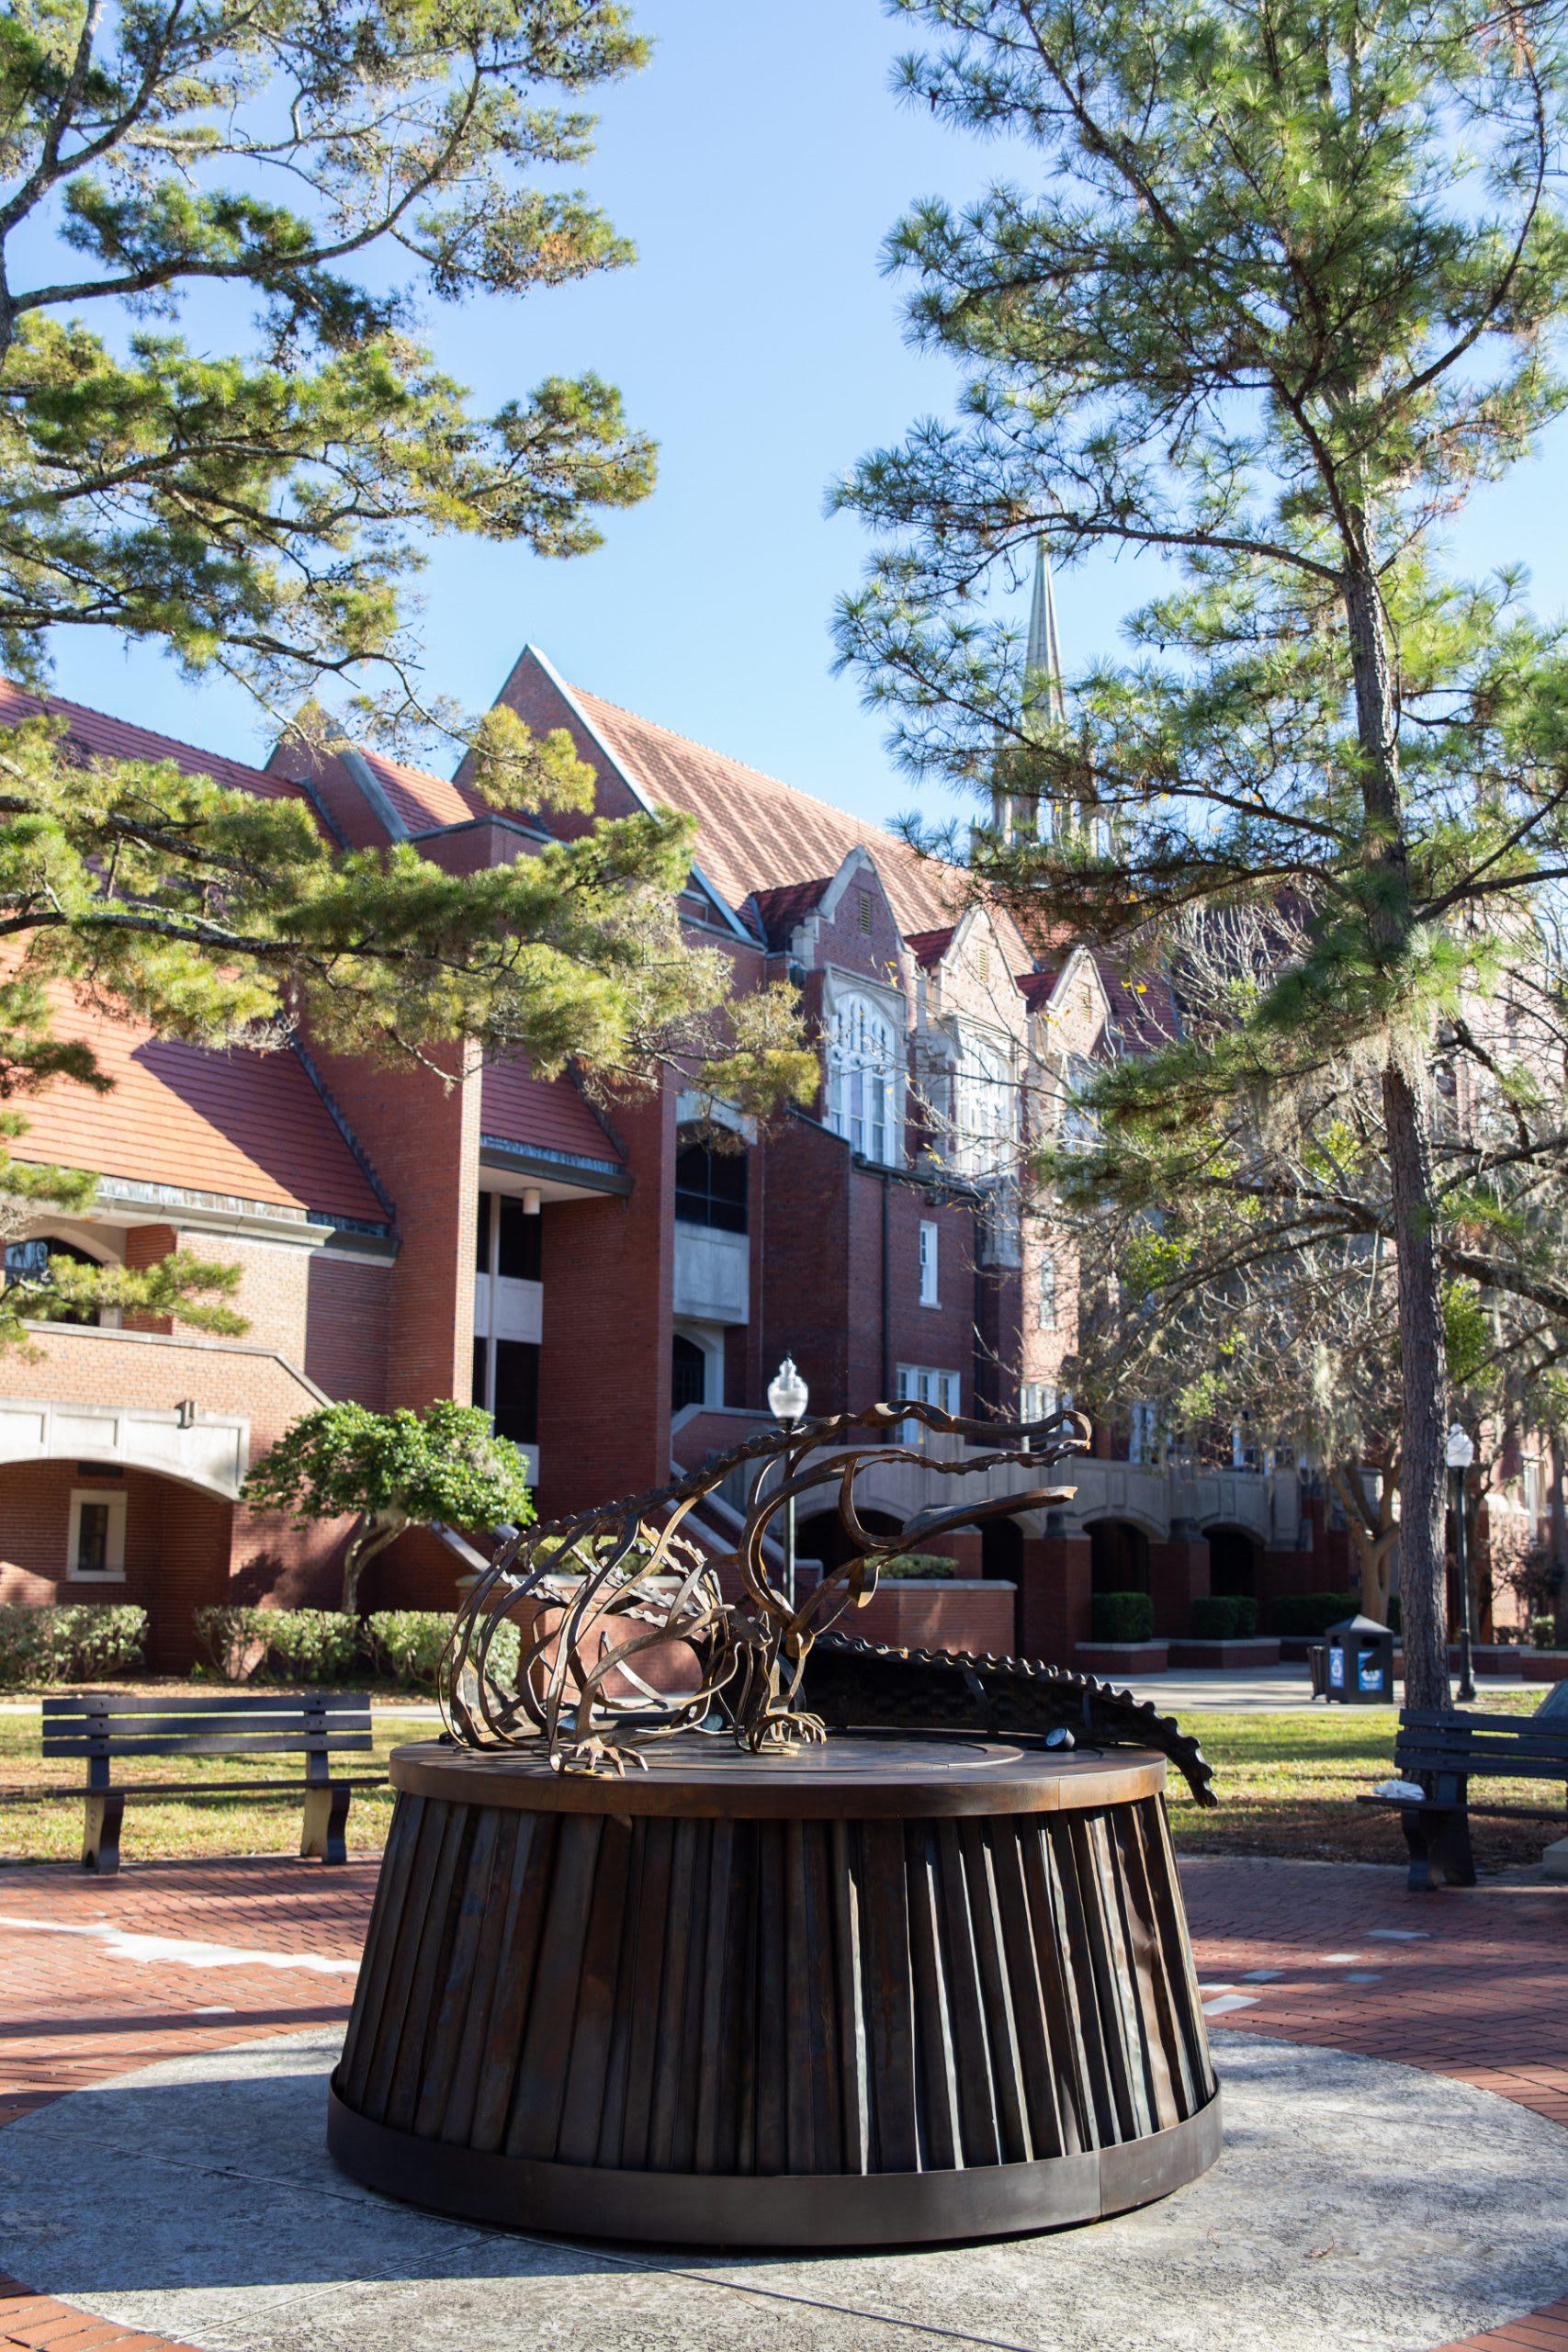 University of Florida Lighted Gator